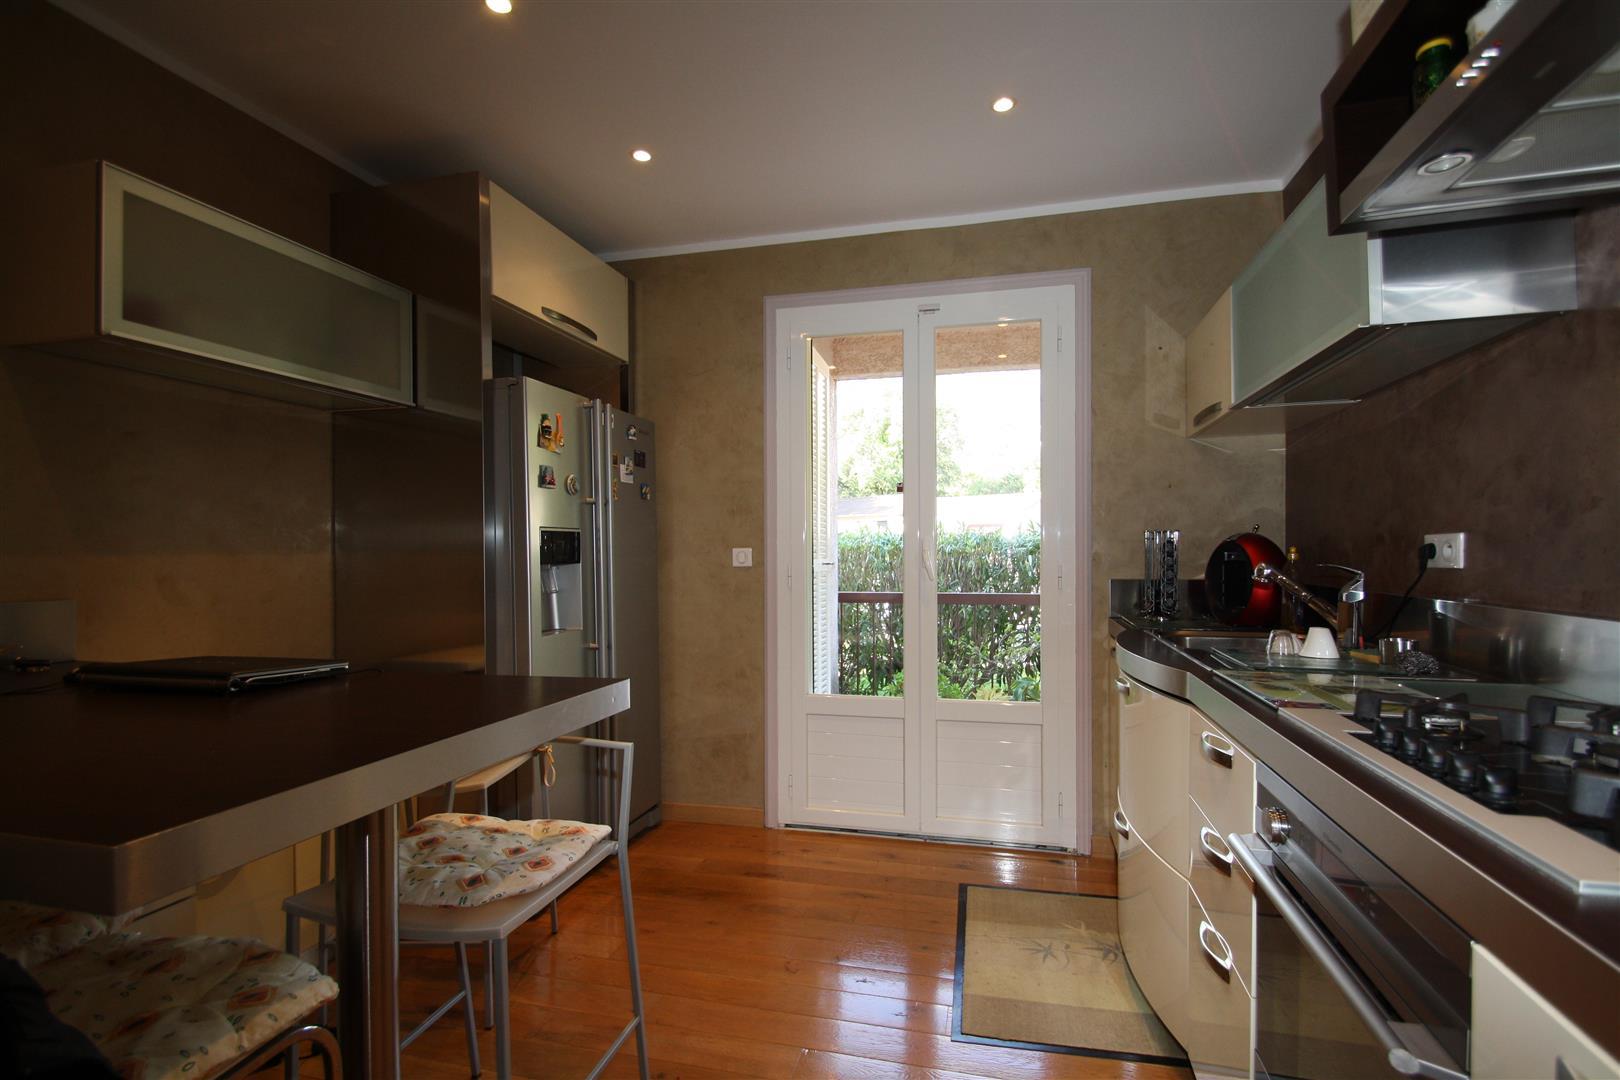 appartement biguglia cuisine equipee agence immobili re bastia avec localisimmo agence. Black Bedroom Furniture Sets. Home Design Ideas